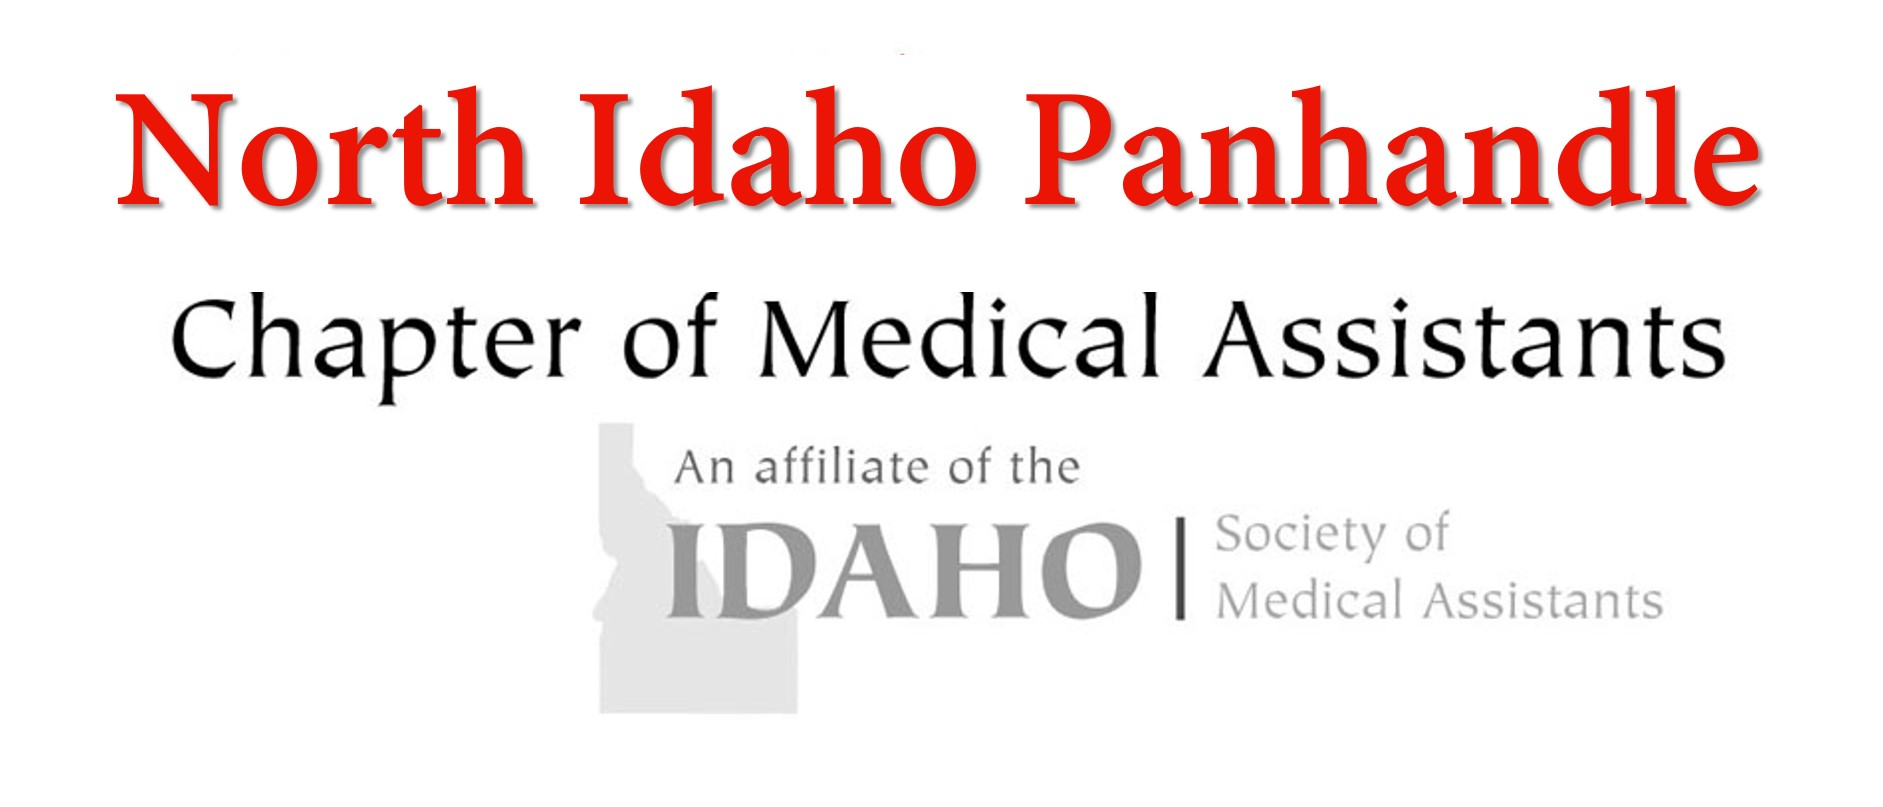 North Idaho Panhandle logo